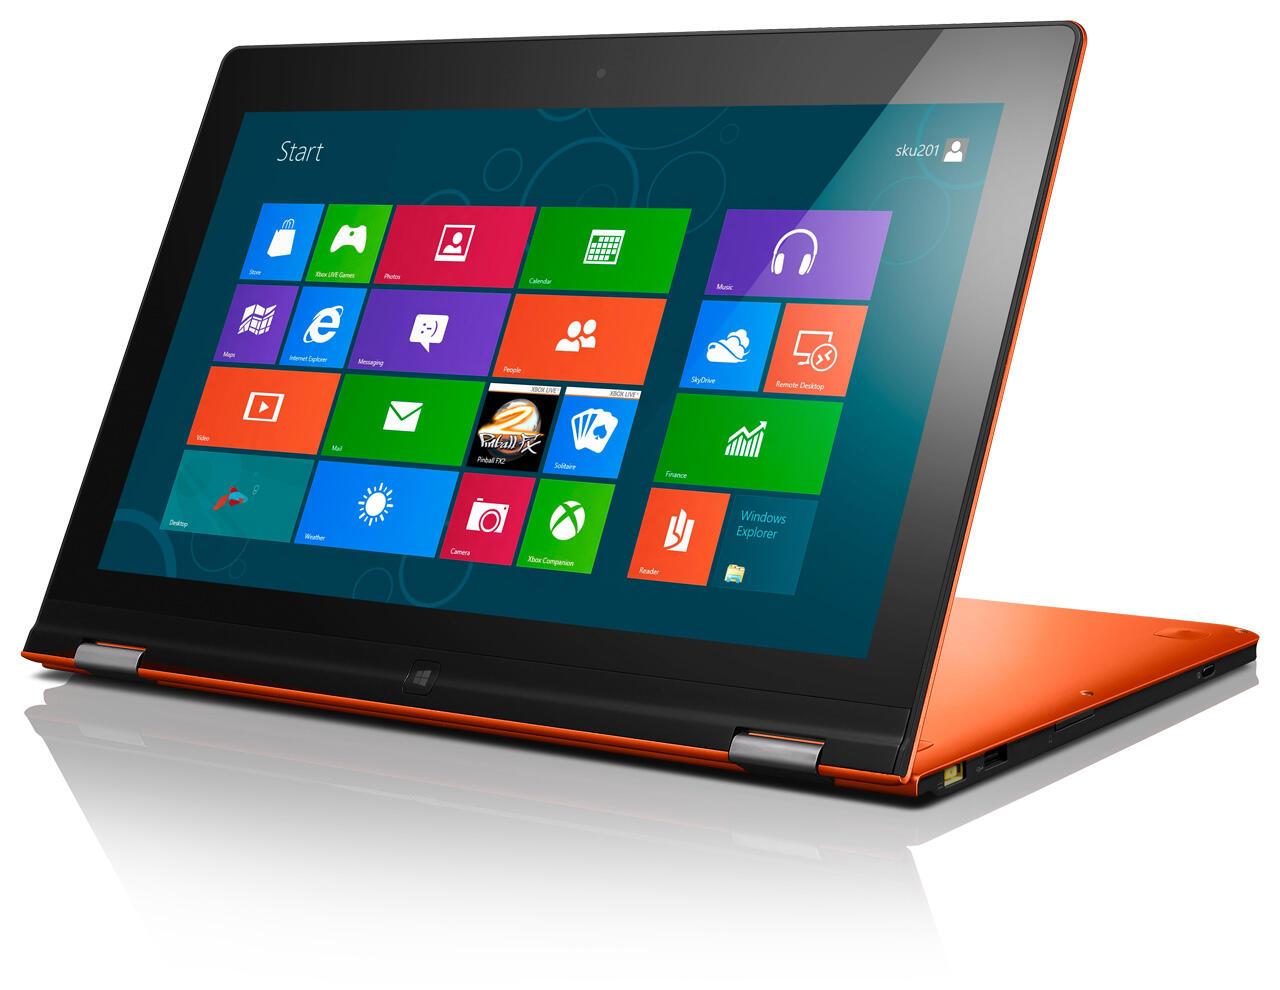 Lenovo IdeaPad Yoga, Notebook Seksi Yang Bisa Kayang